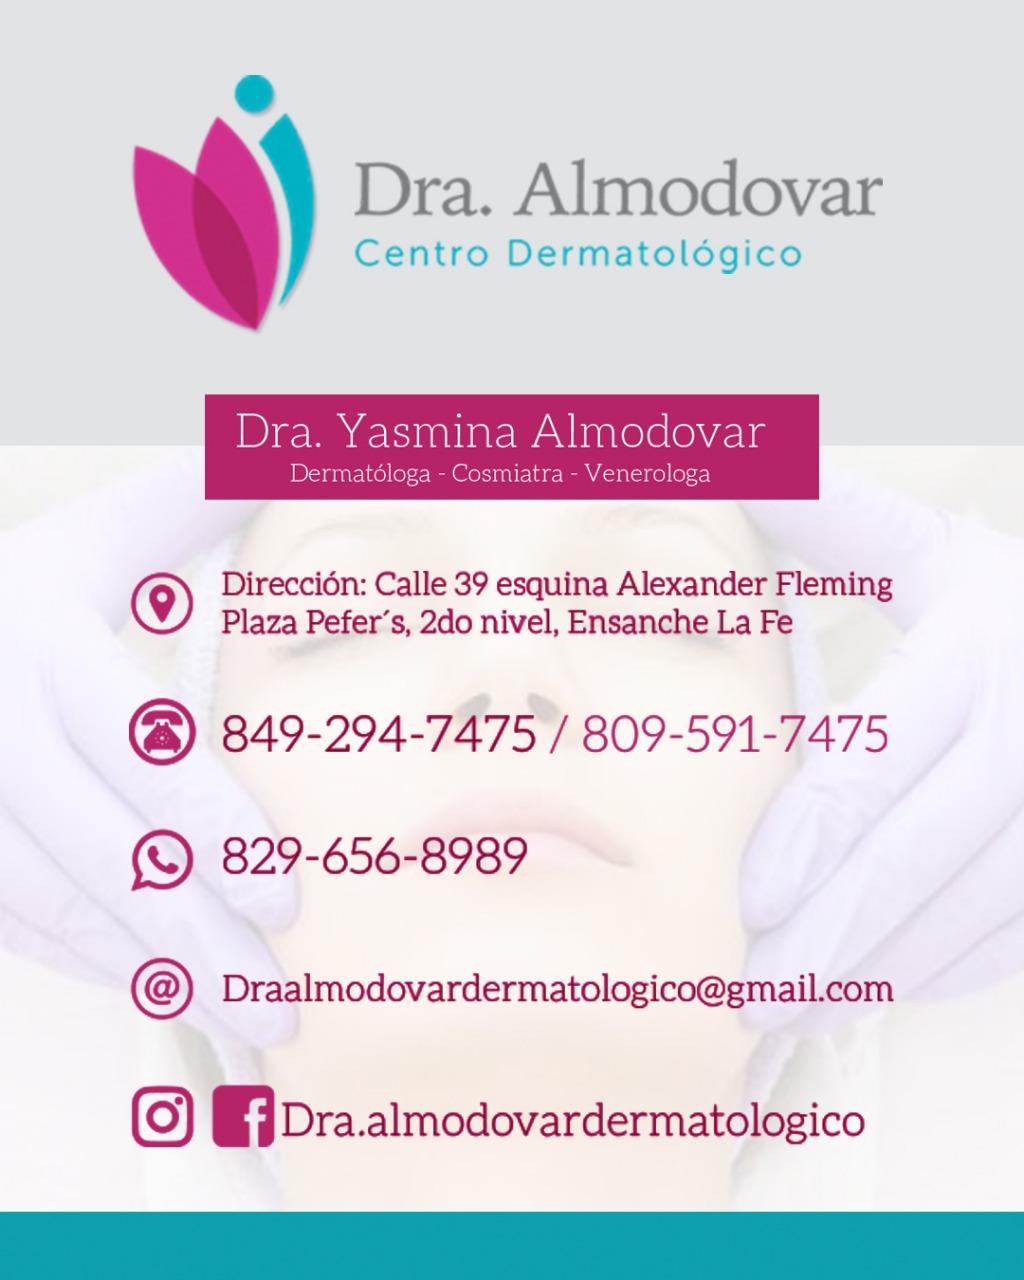 Dra. Almodovar, Centro Dermatológico